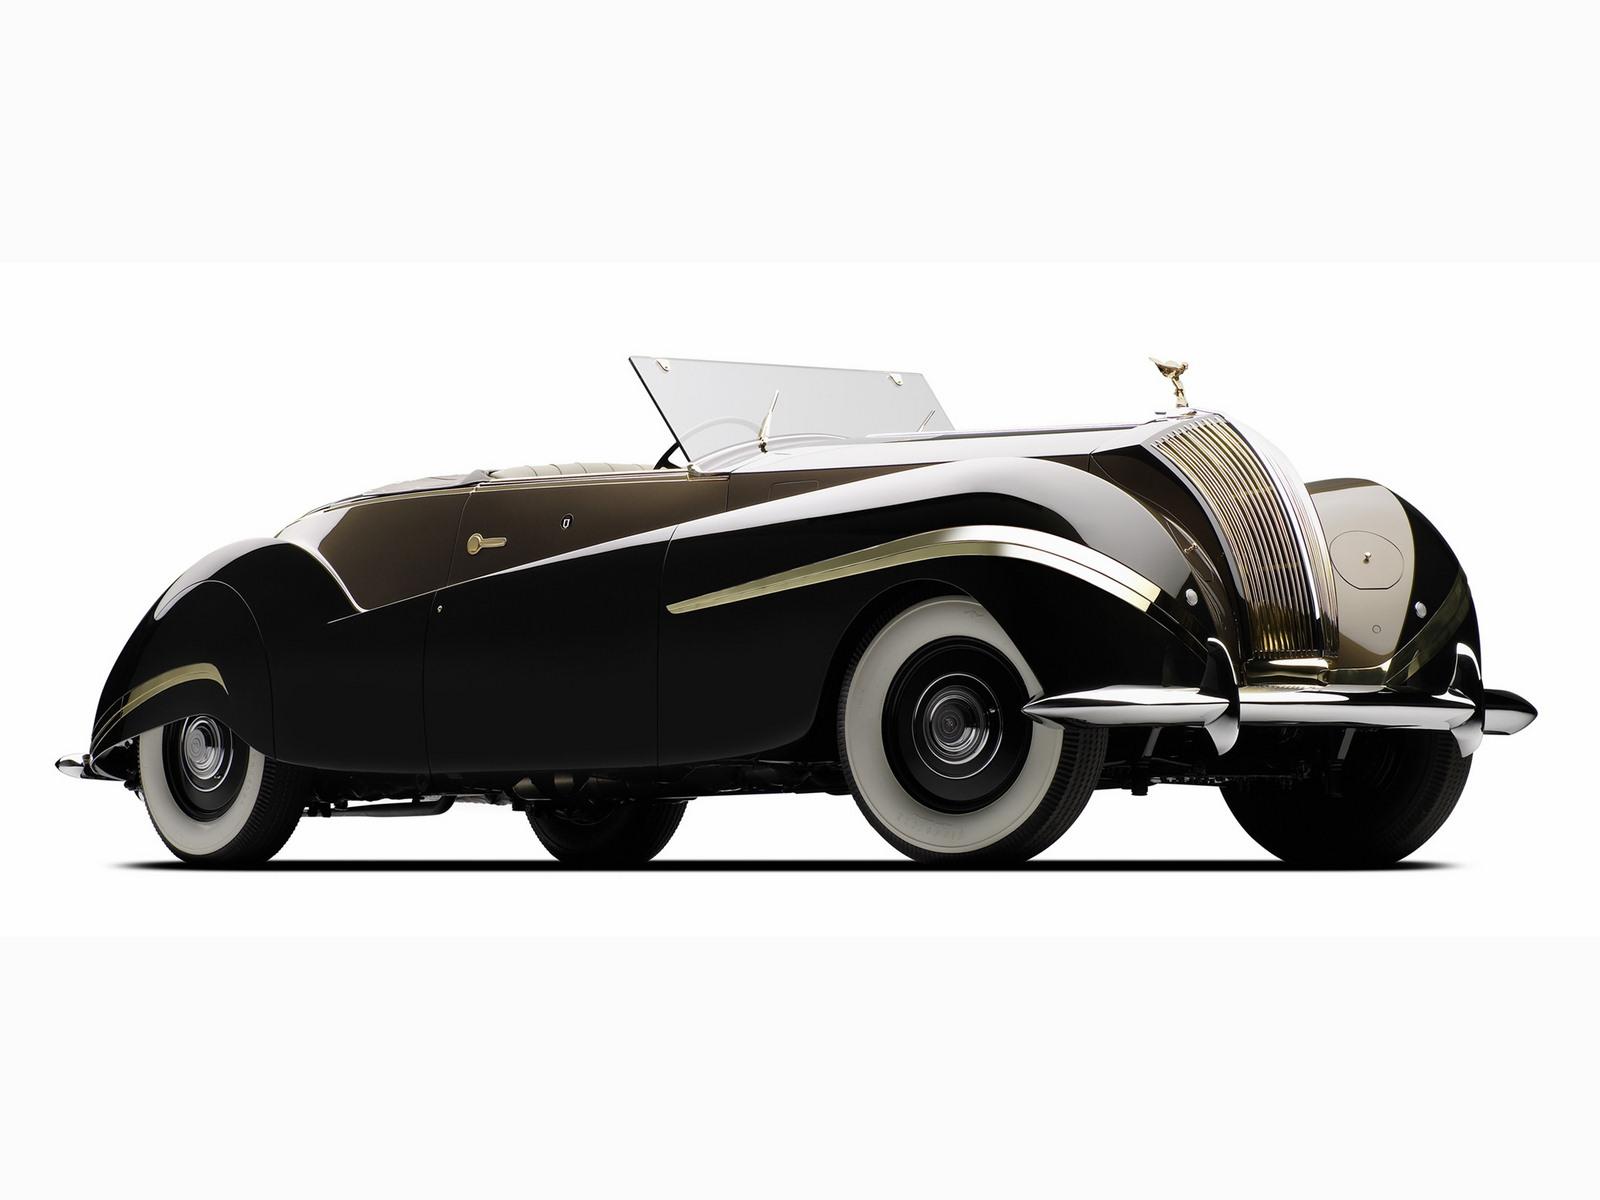 1947. Rolls Royce Phantom III Labourdette Vutotal Cabriolet